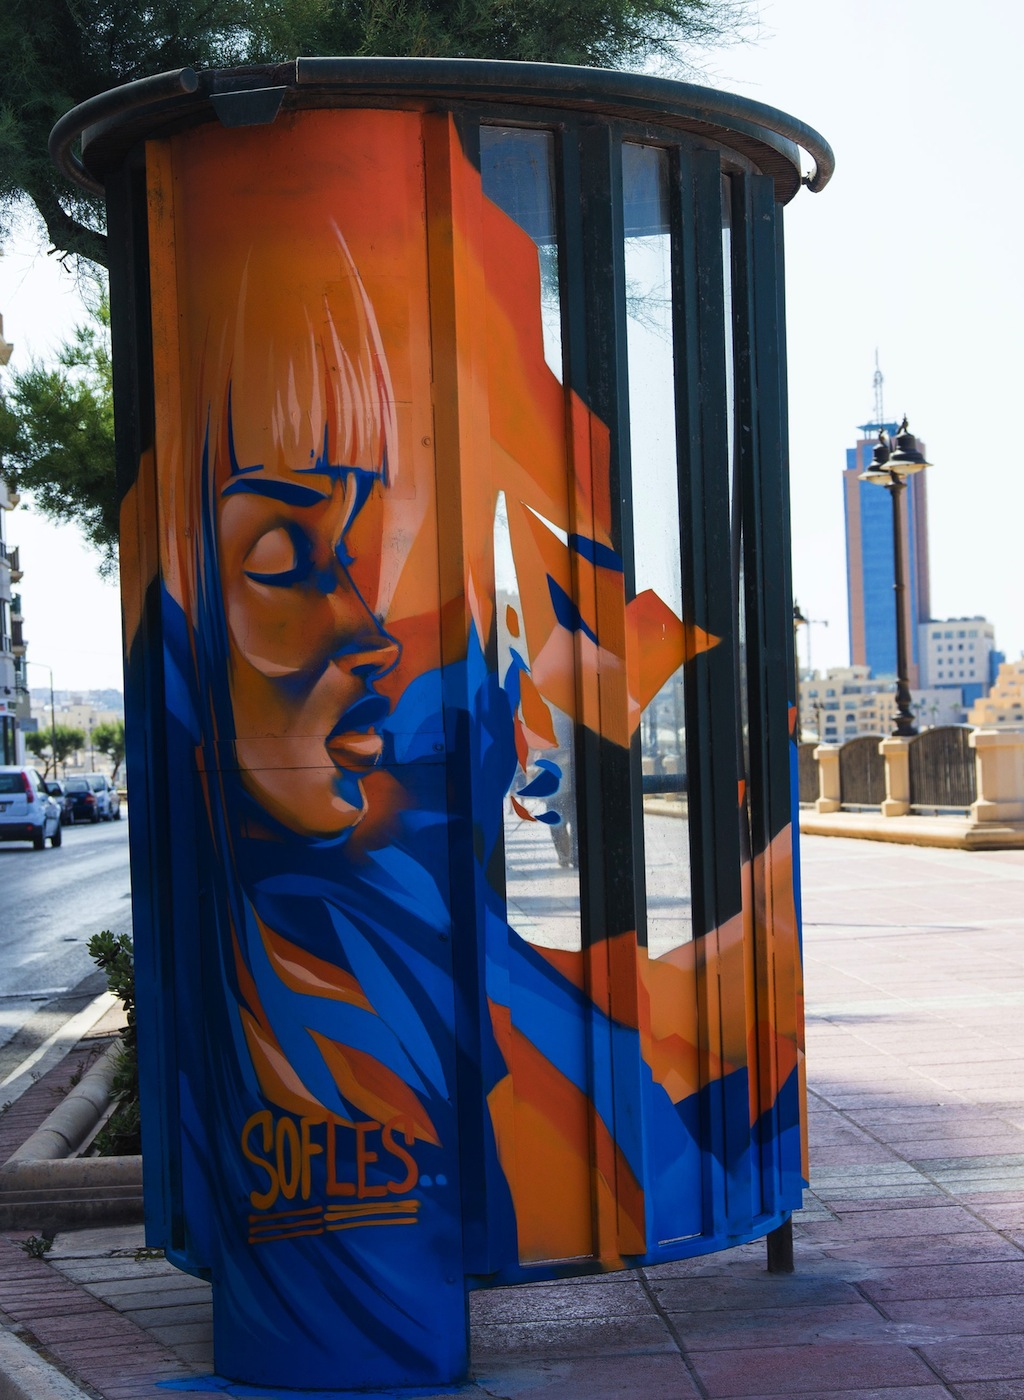 By Sofles at the Sliema Street Art Festival. Photo by Asperholm Productions in Sliema, Malta